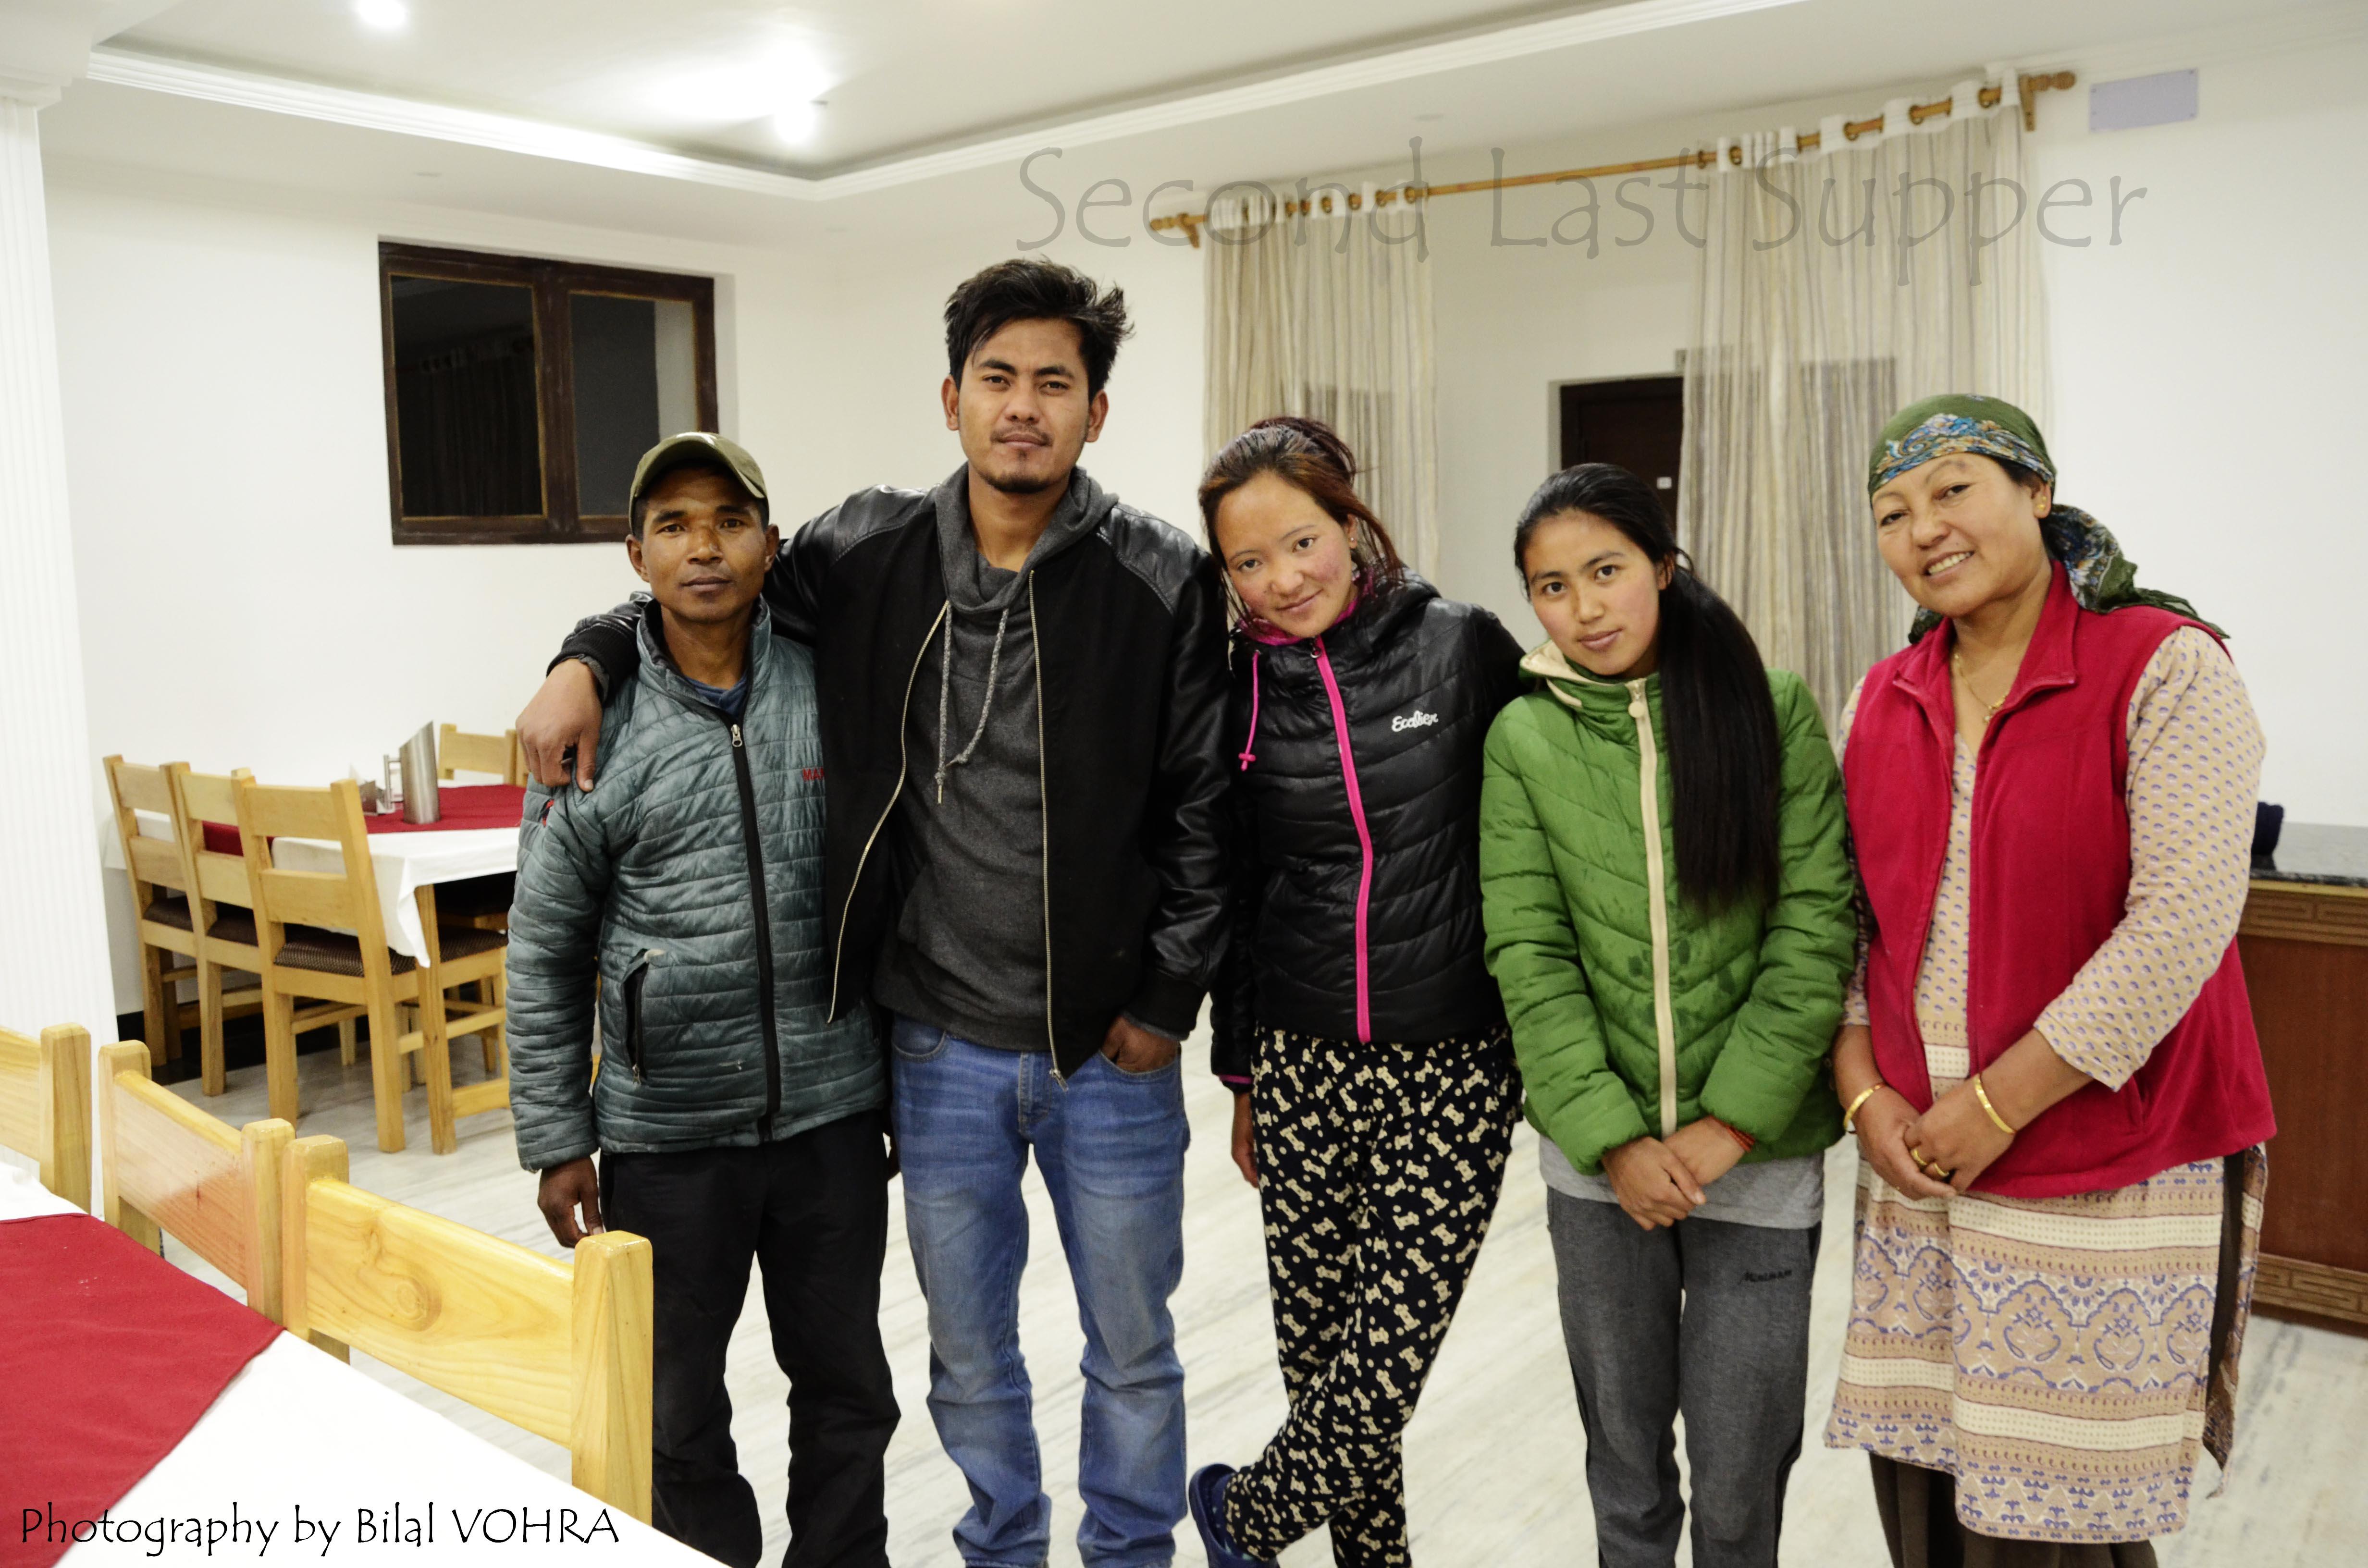 from L-R Kumar Tawang (chef), Tsewang Nurbu (owner), Deachen Chonzom (Help), Kunzang Angmo (help), Yeznchen Lanzes (Mom, Ladakhi cook)